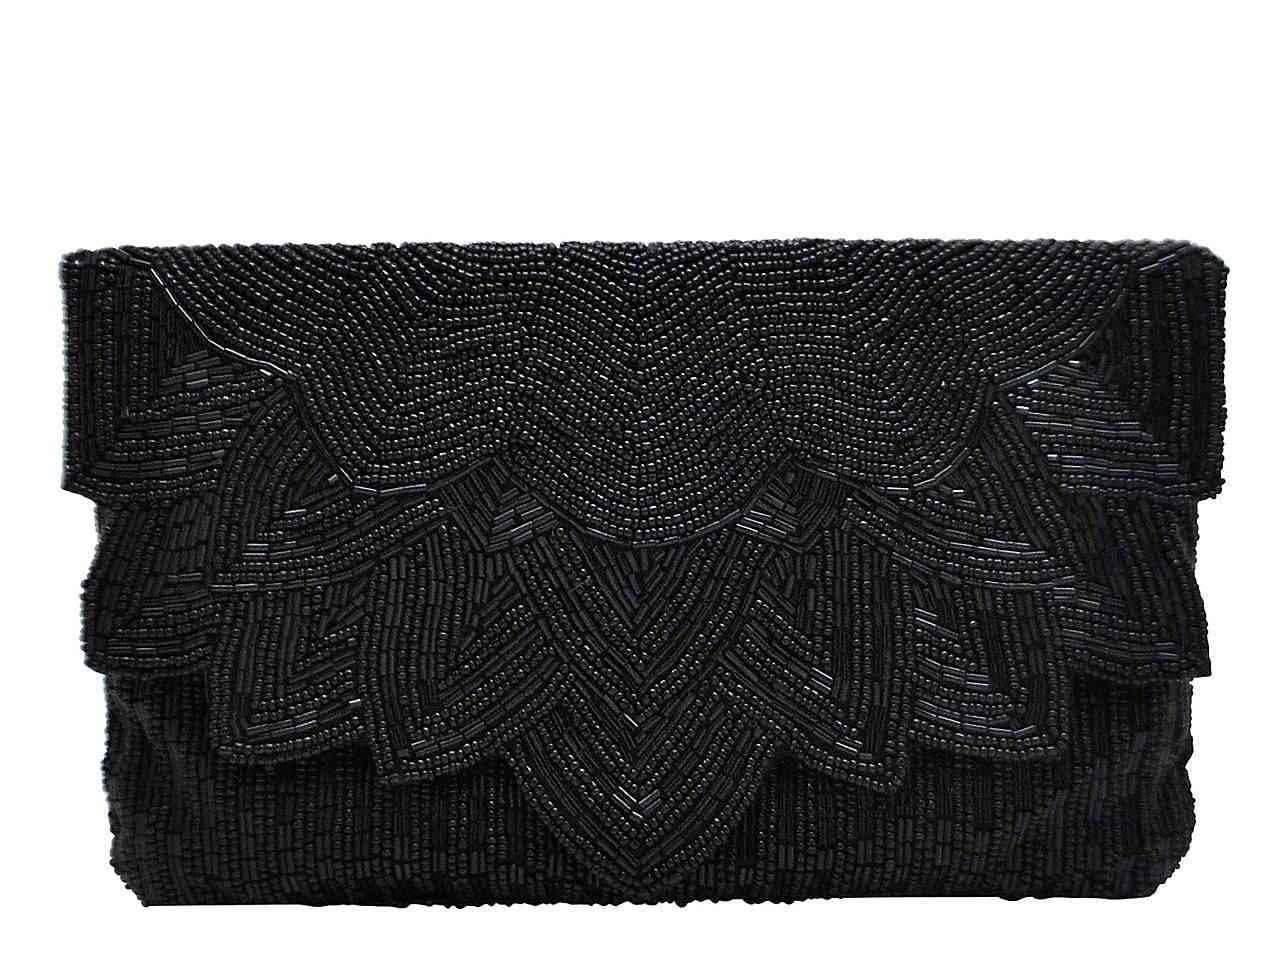 La Regale Sunburst Clutch Women's Handbags & Accessories   DSW